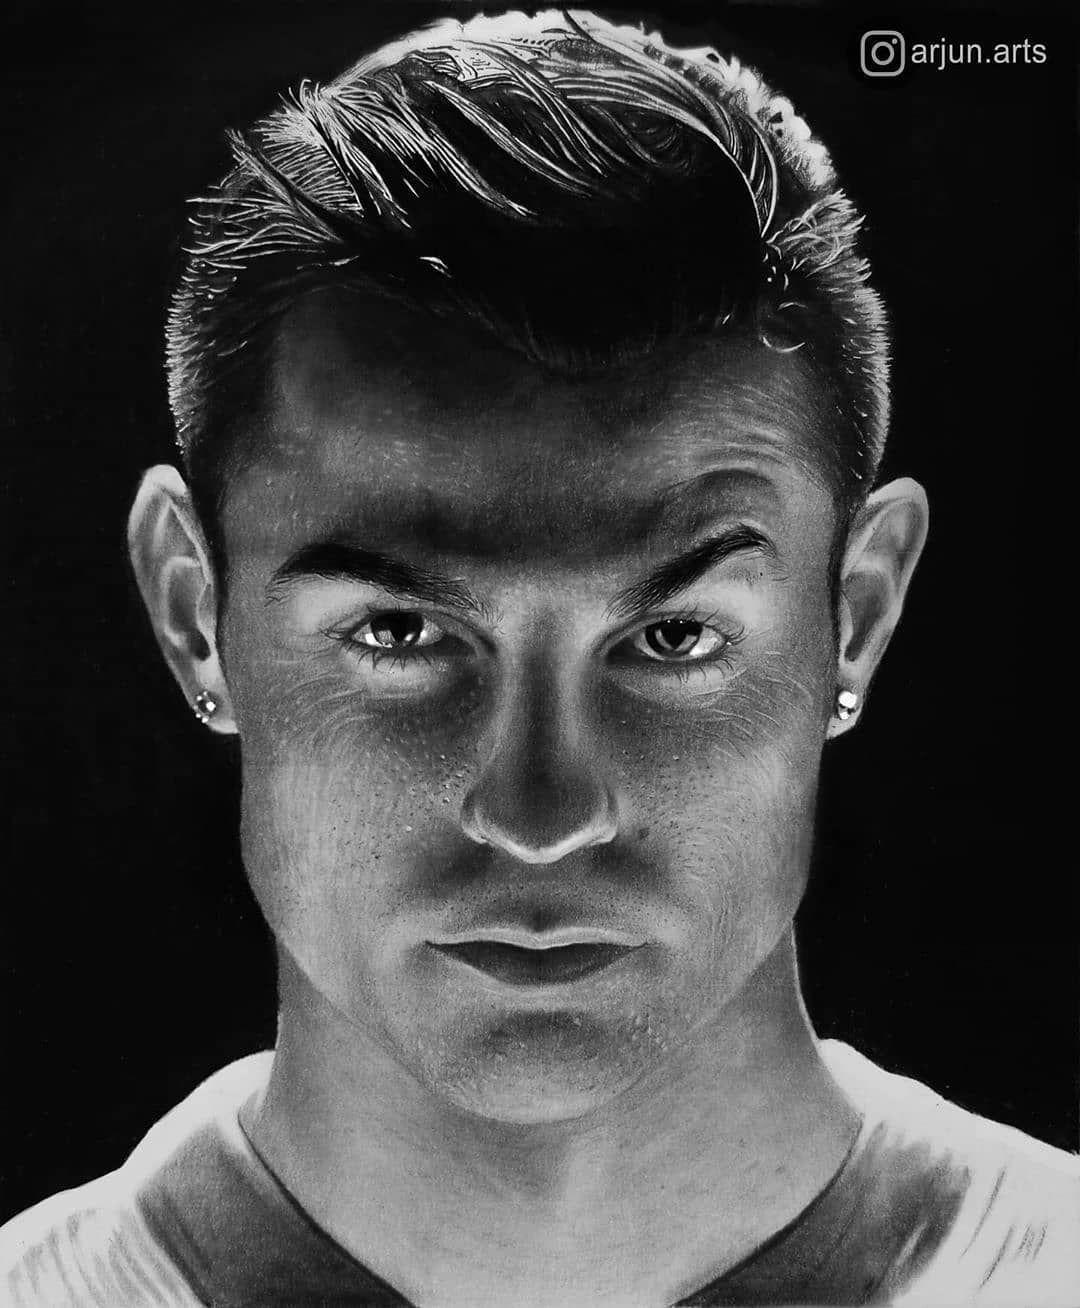 Art by arjun.arts • • • • • • Manjeri Cristiano Ronaldo